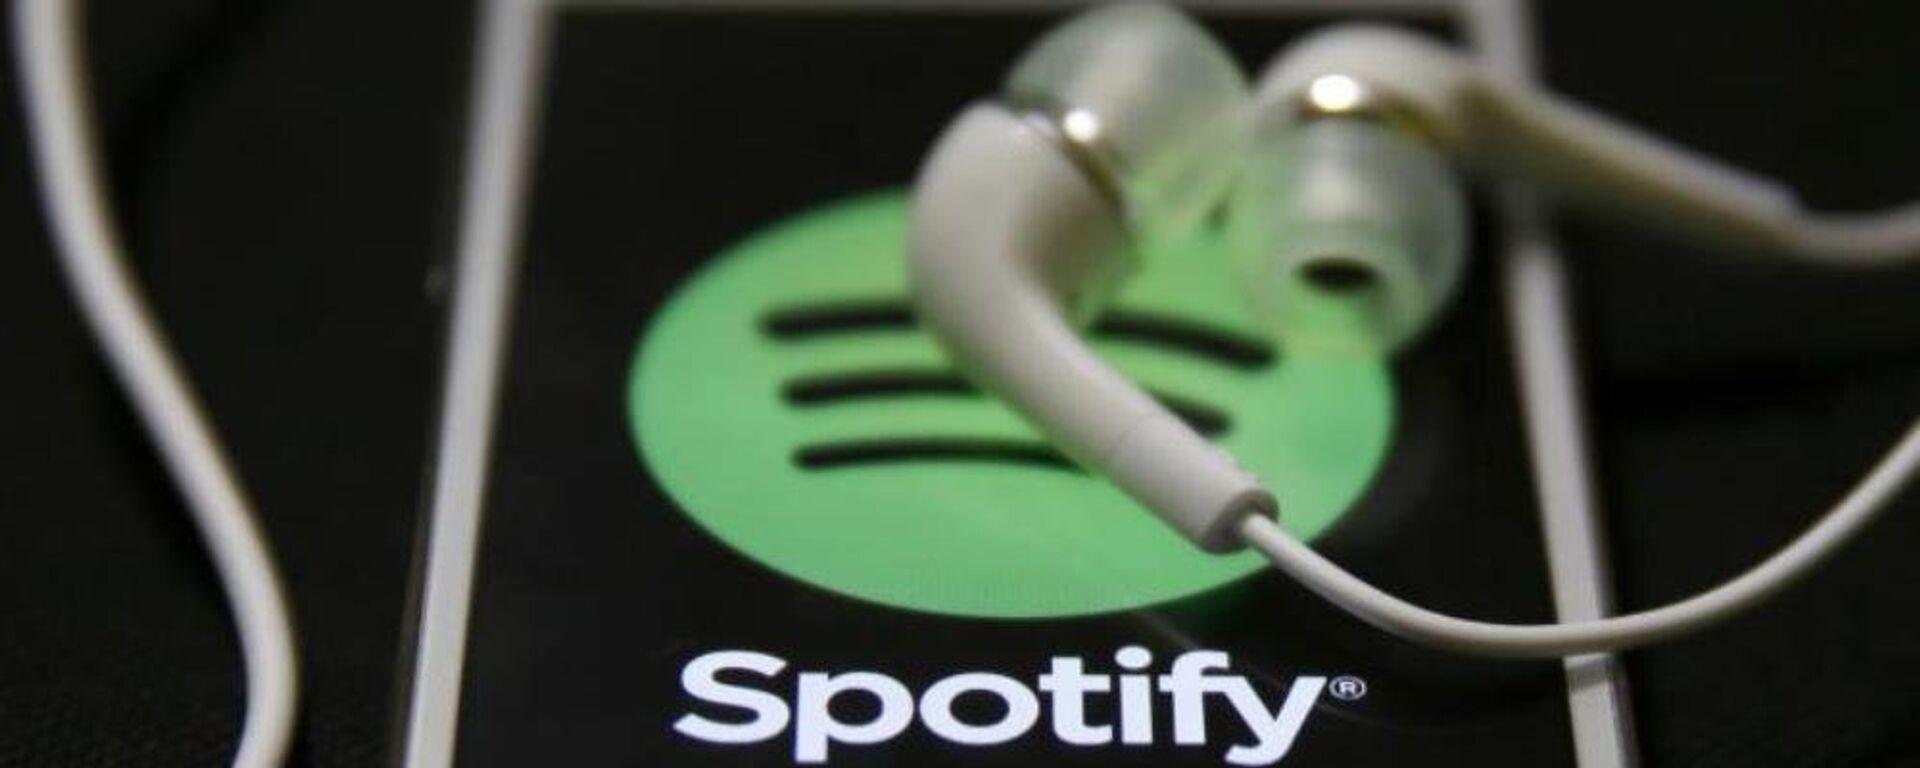 Spotify (imagen referencial) - Sputnik Mundo, 1920, 07.05.2021